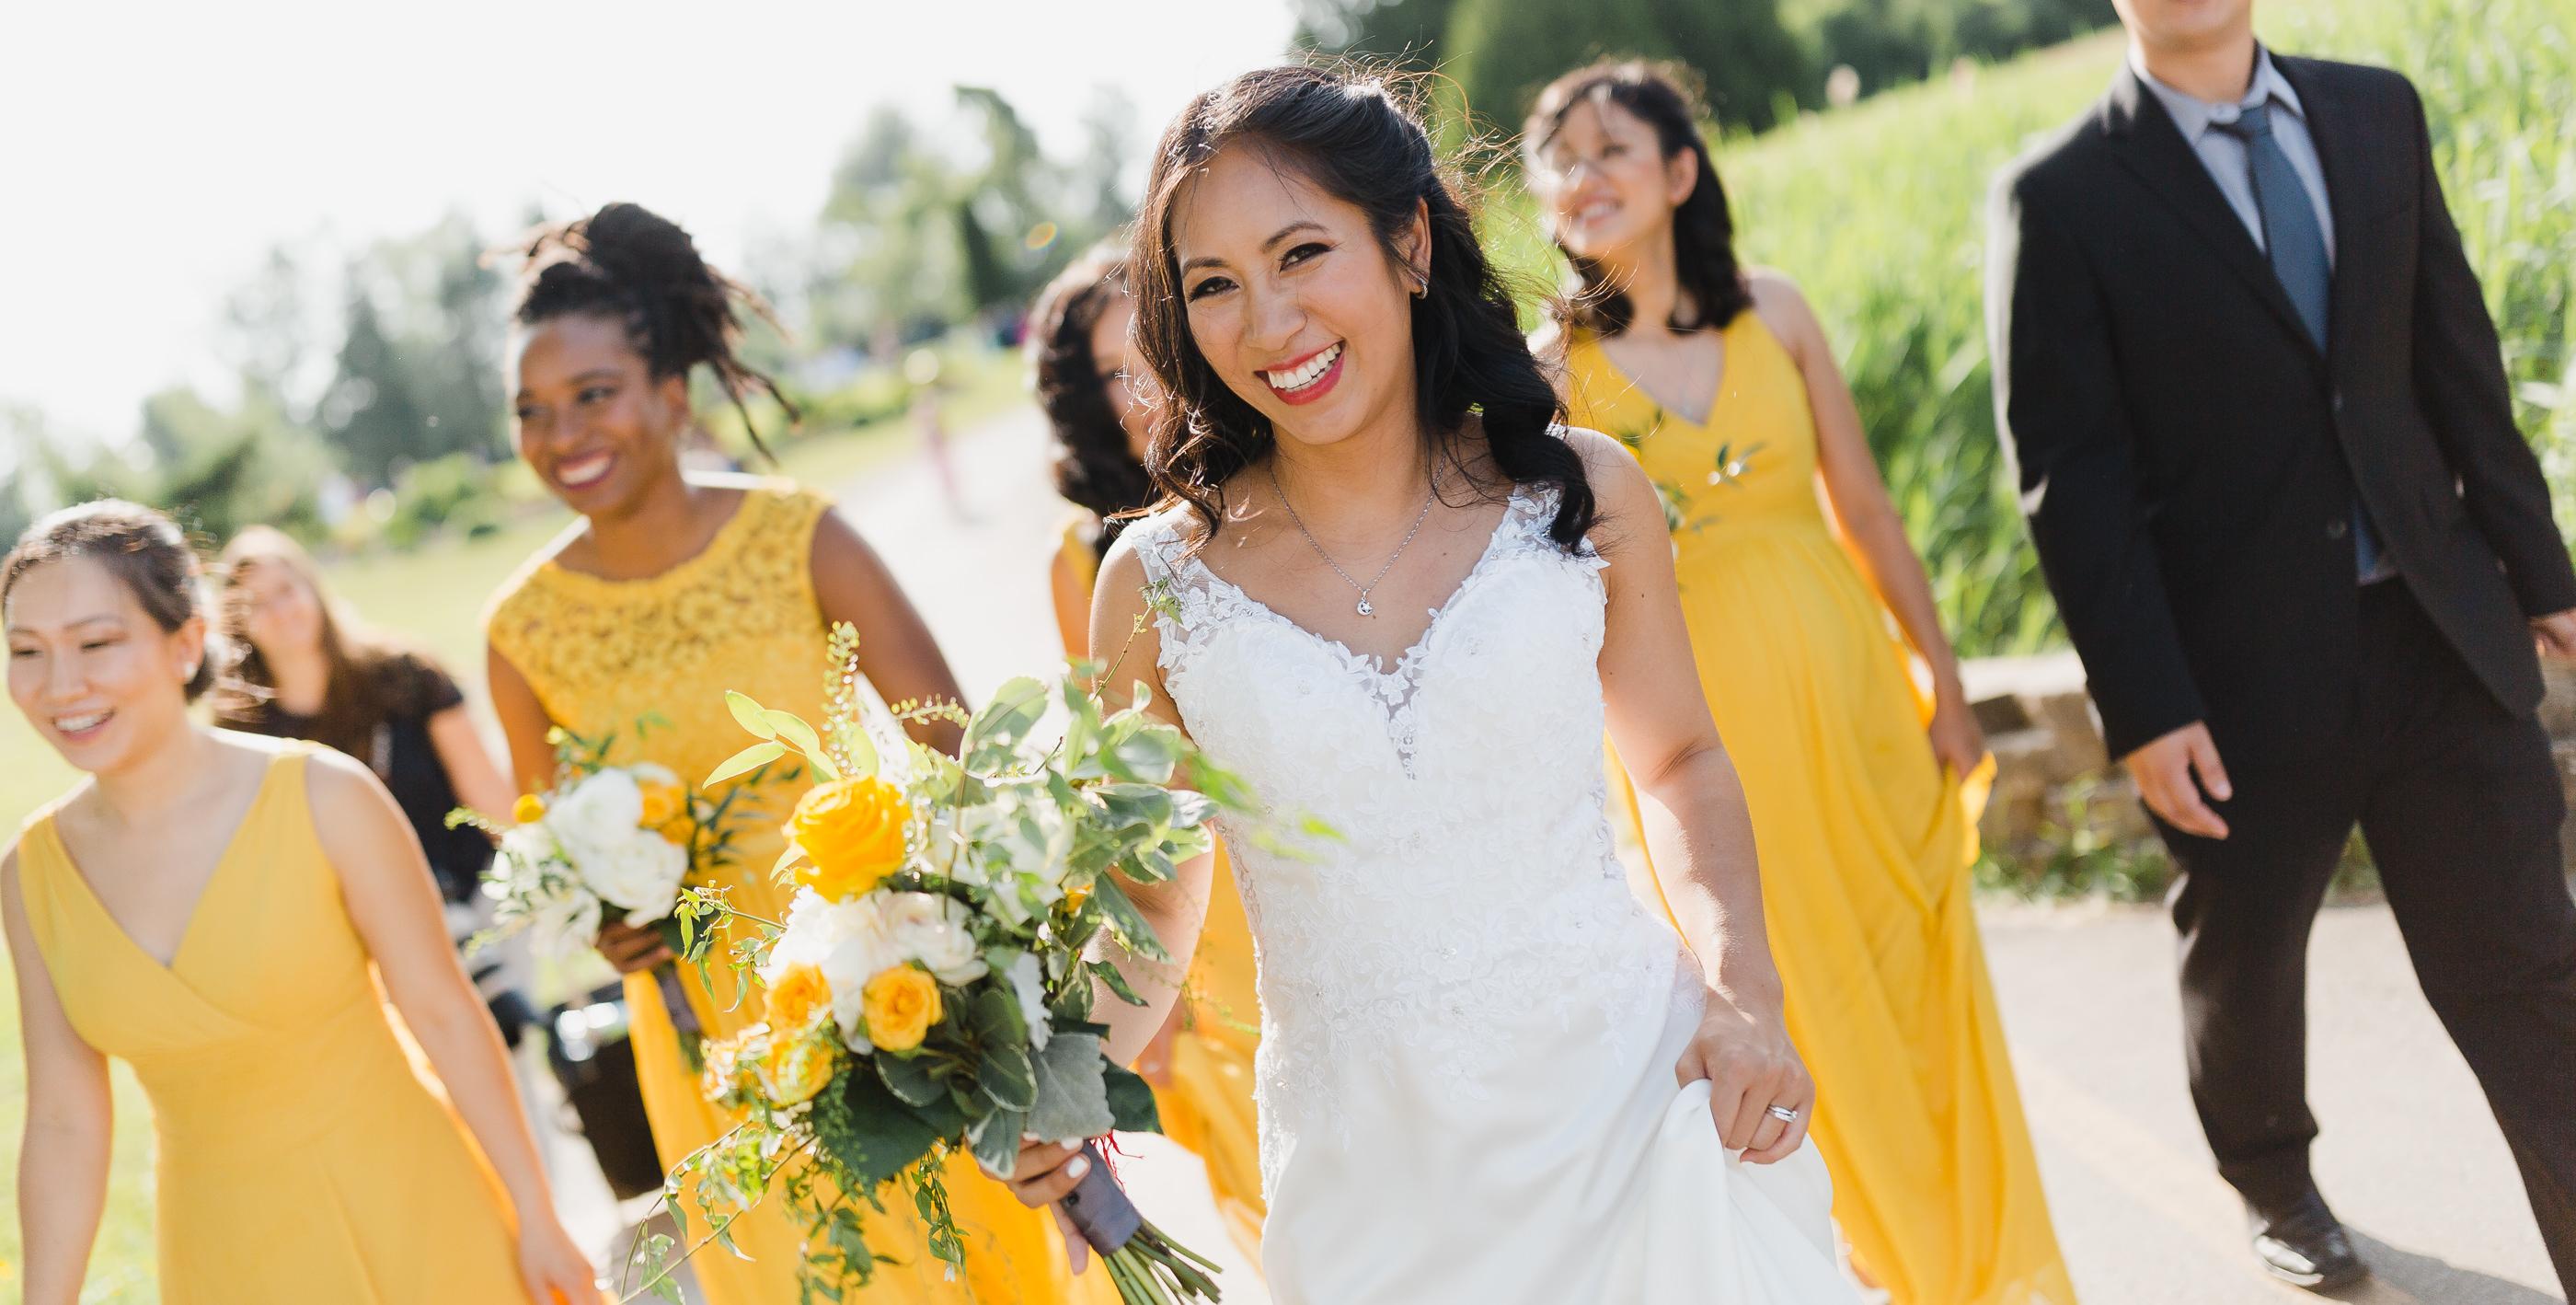 portfolio-photographies-de-mariage-sonia-bourdon-023